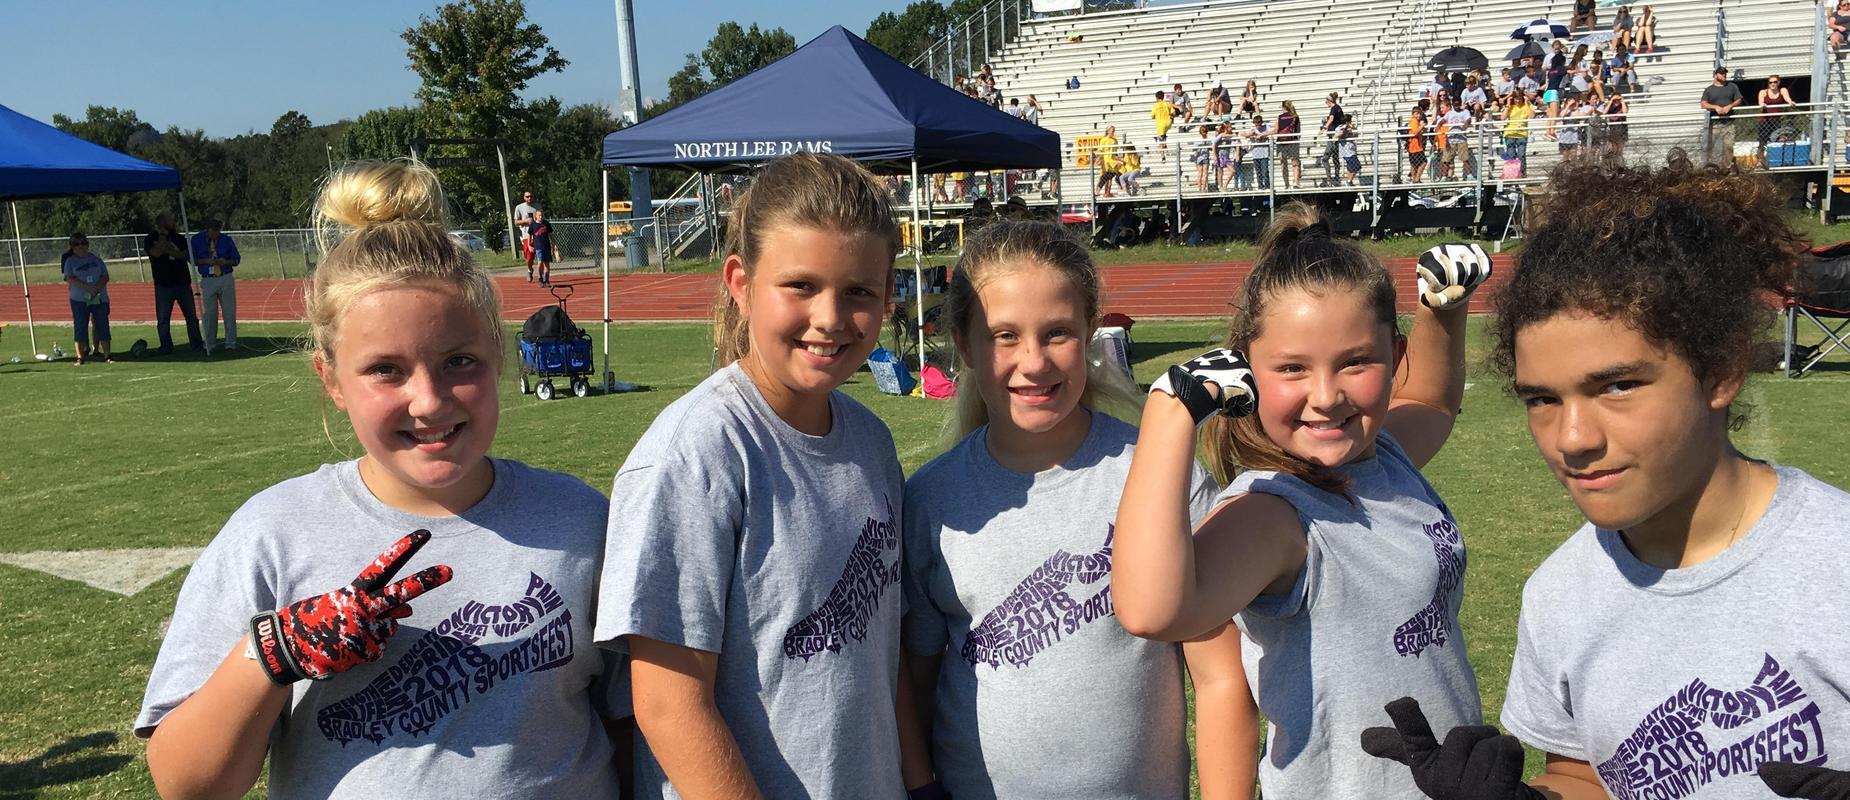 Sportsfest athletes